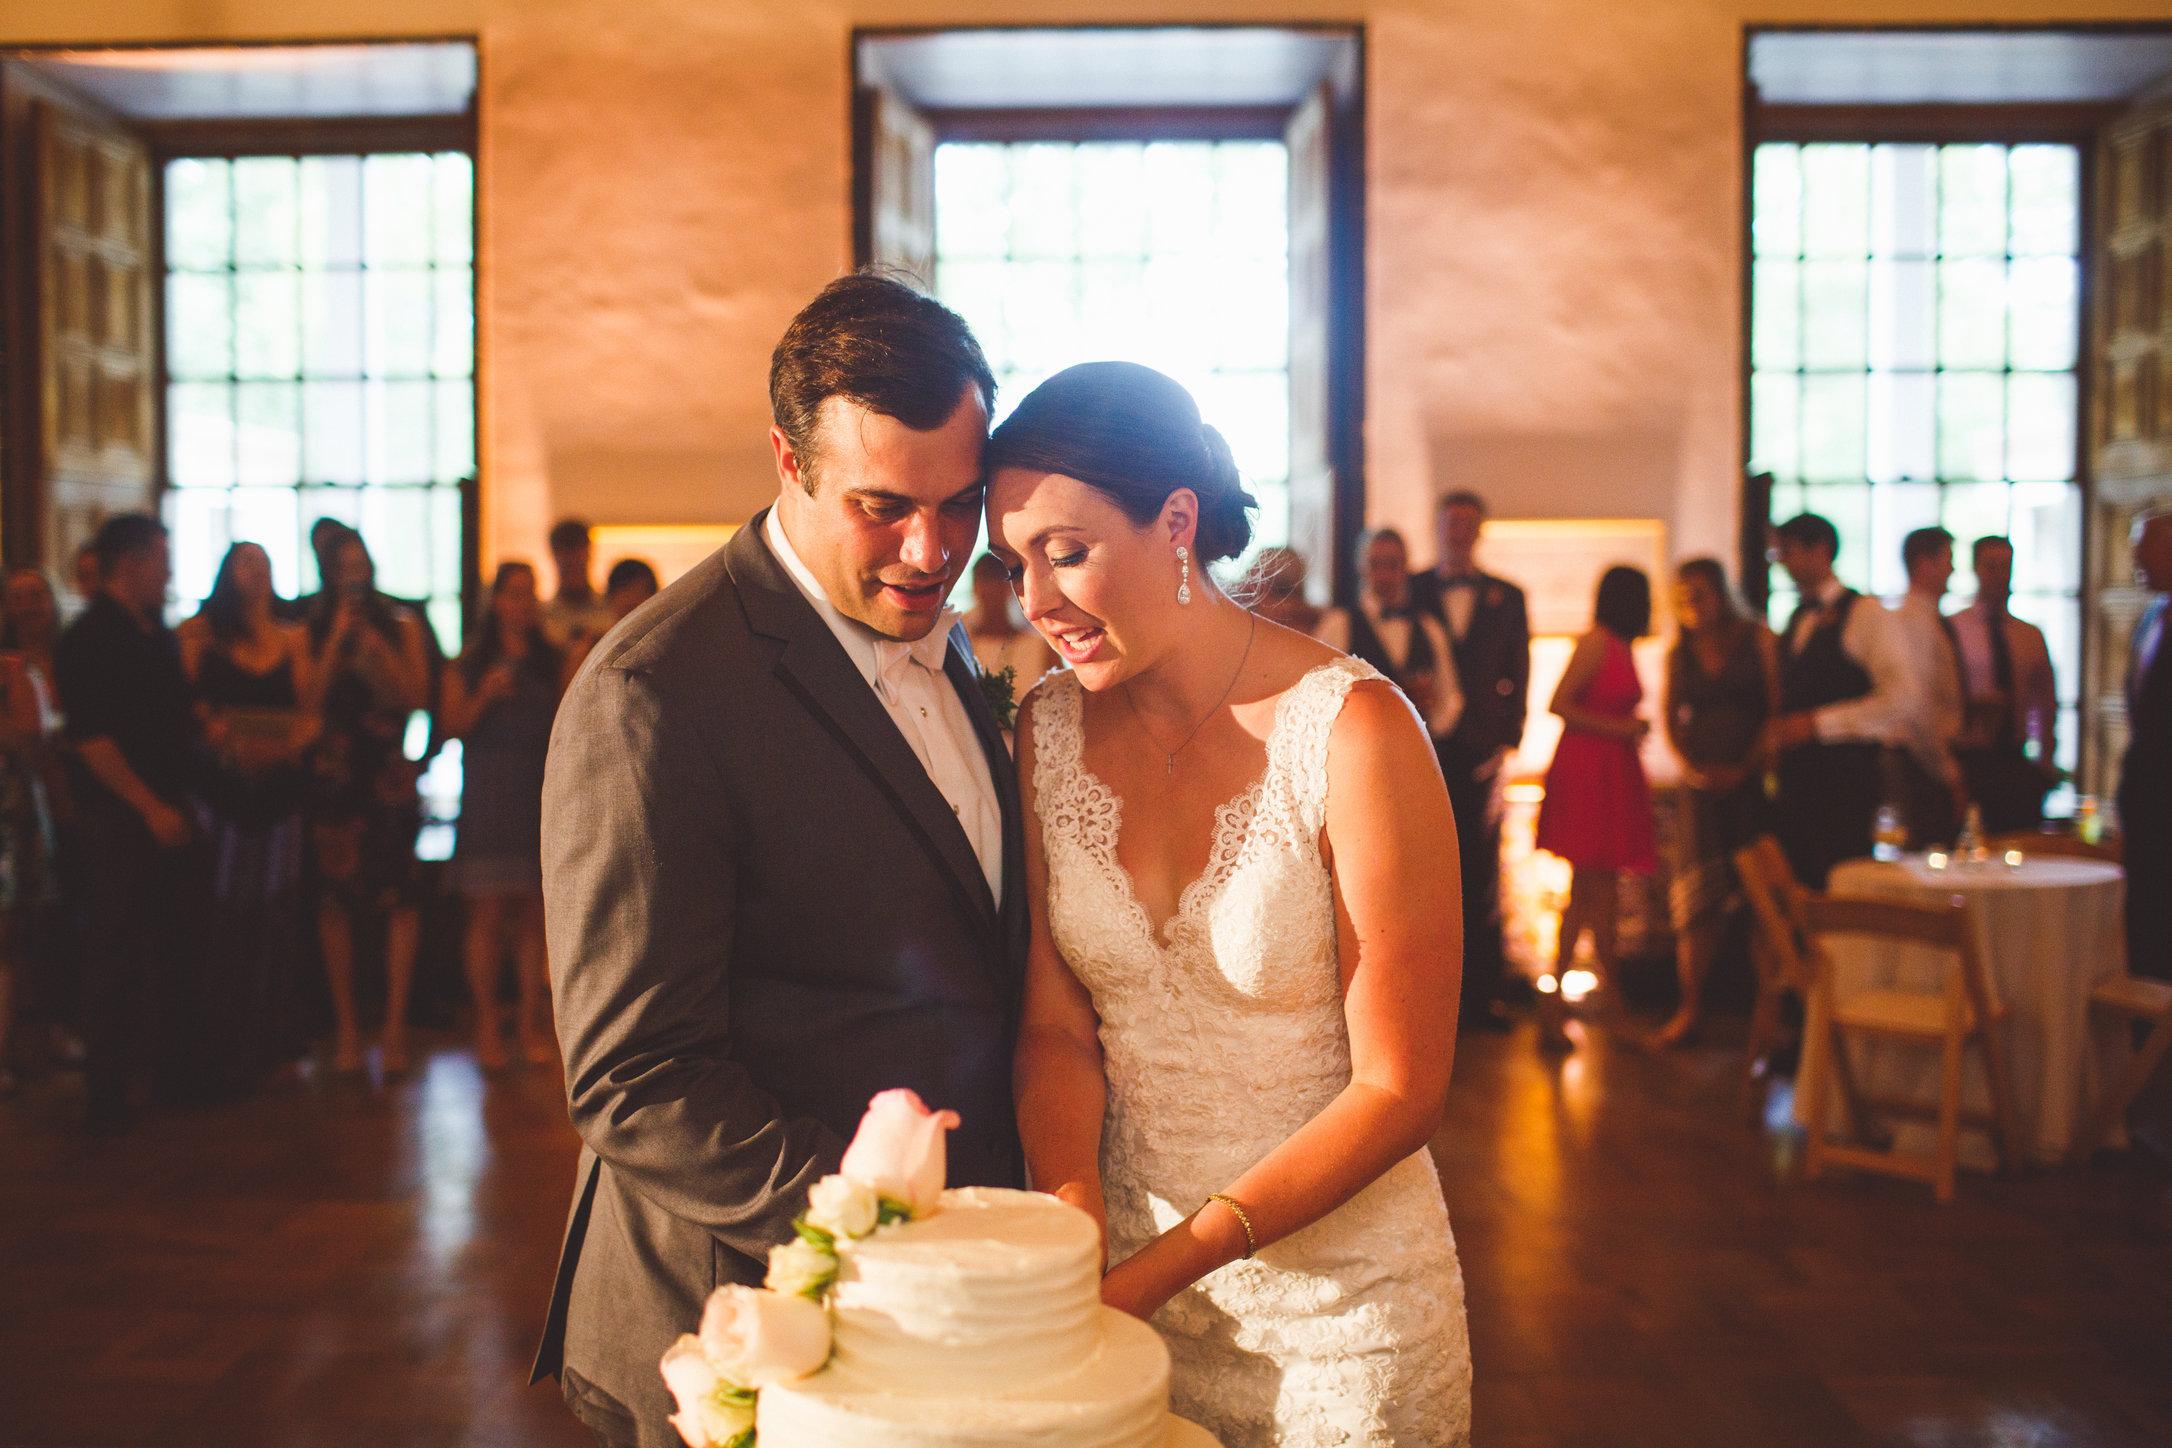 SandC-wedding-598.jpg